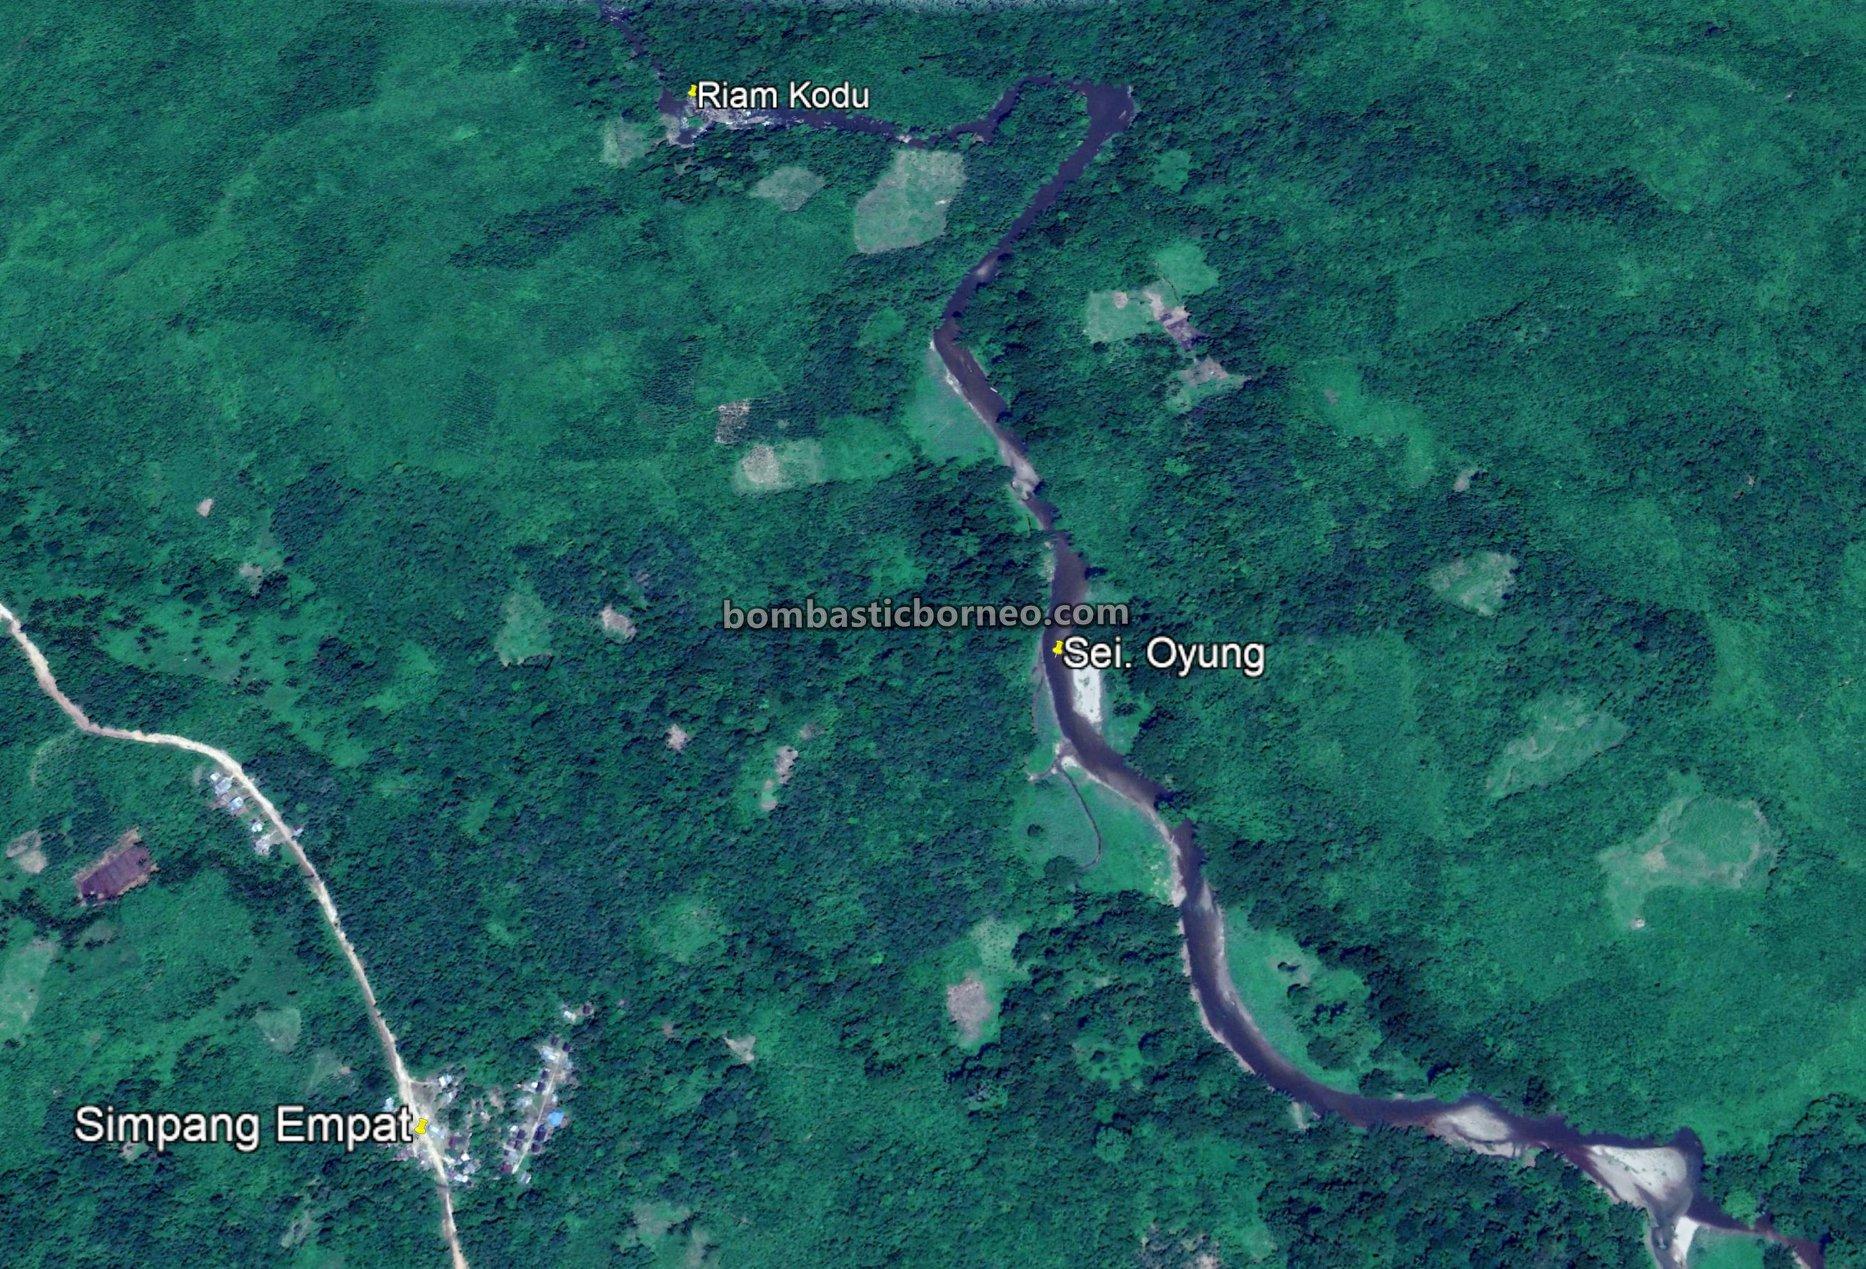 Air Terjun, Riam Kodu, Dusun Simpang Empat, adventure, jungle trekking, Kalimantan Barat, Desa Bengkawan, Seluas, Wisata Alam, Tourism, Cross Border, Borneo, destination, 探索婆罗洲瀑布, 印尼西加里曼丹,